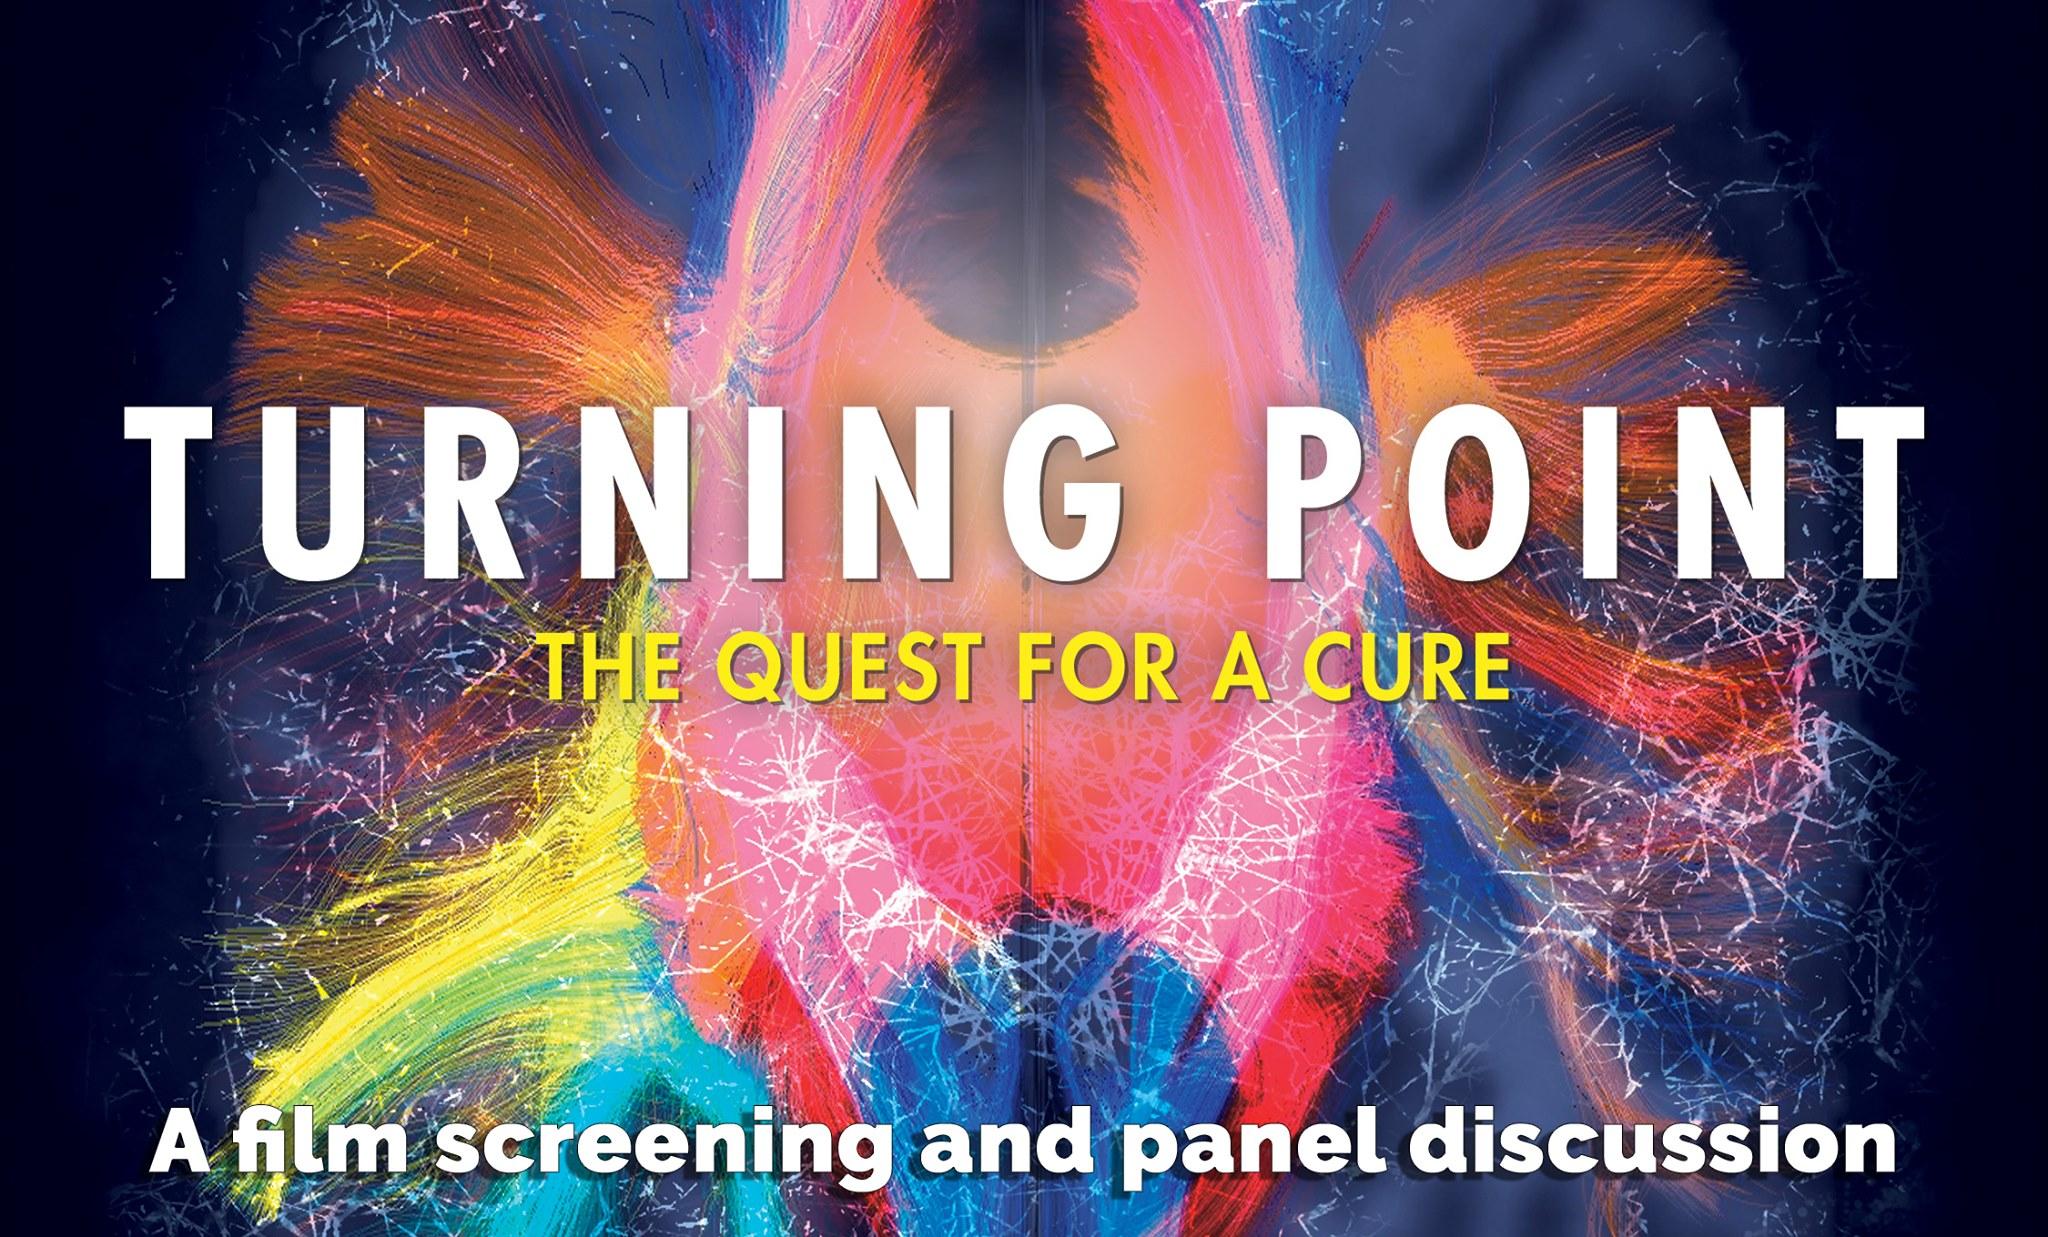 Turning Point Movie